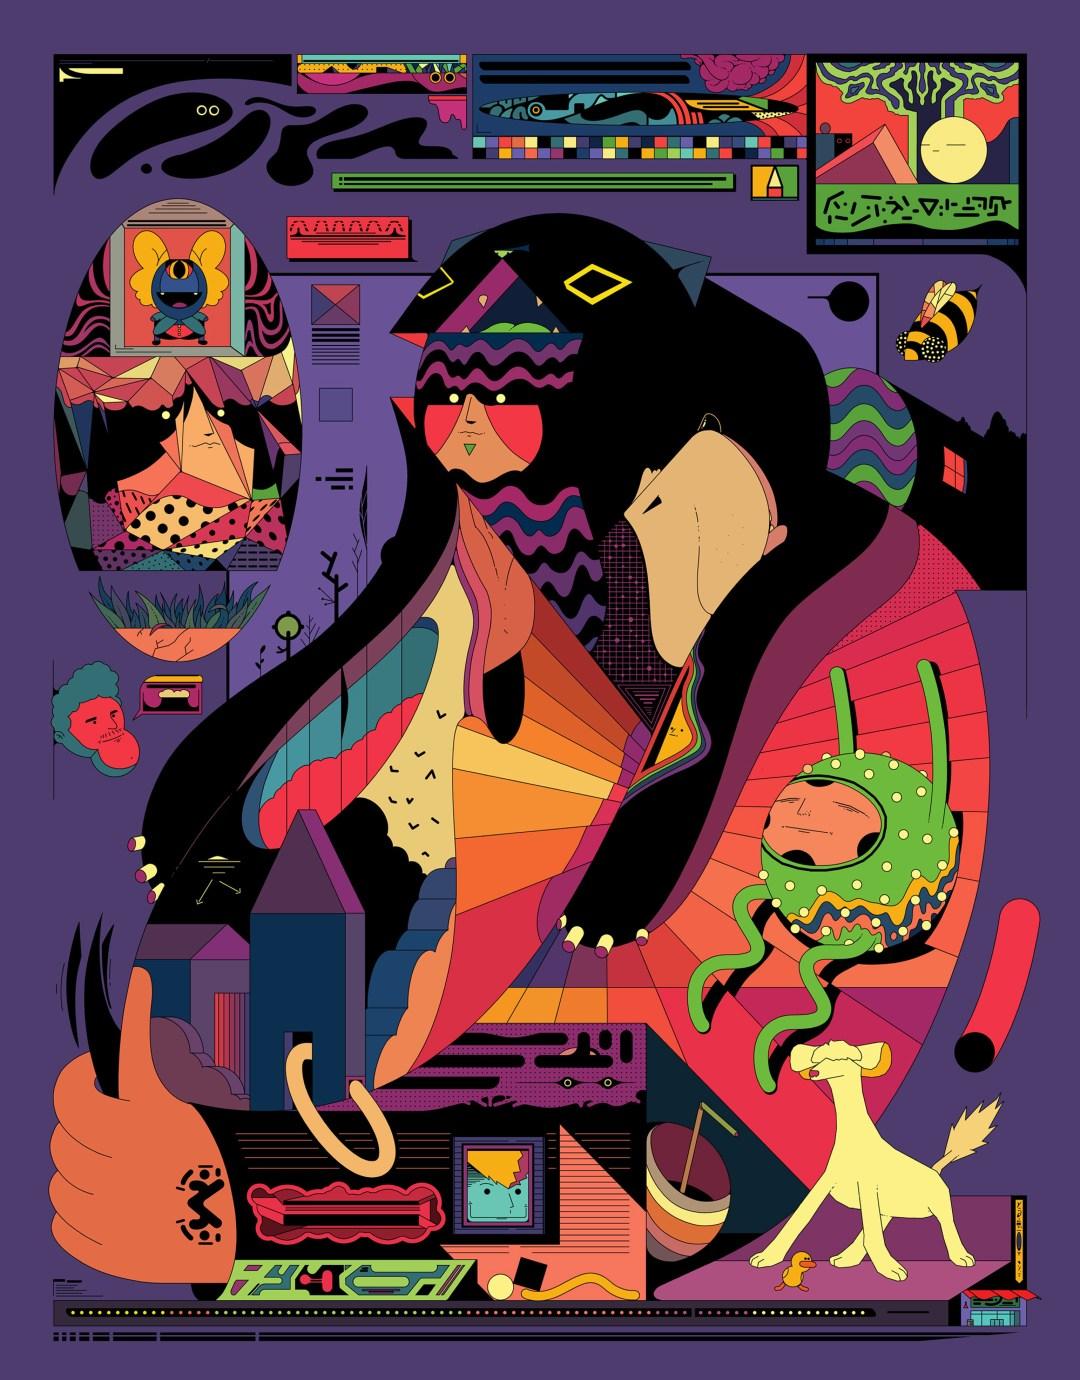 Fantastical Cartoons, Robotic Pets, and Vibrant Architecture Populate Digital lllustrations by Ori Toor